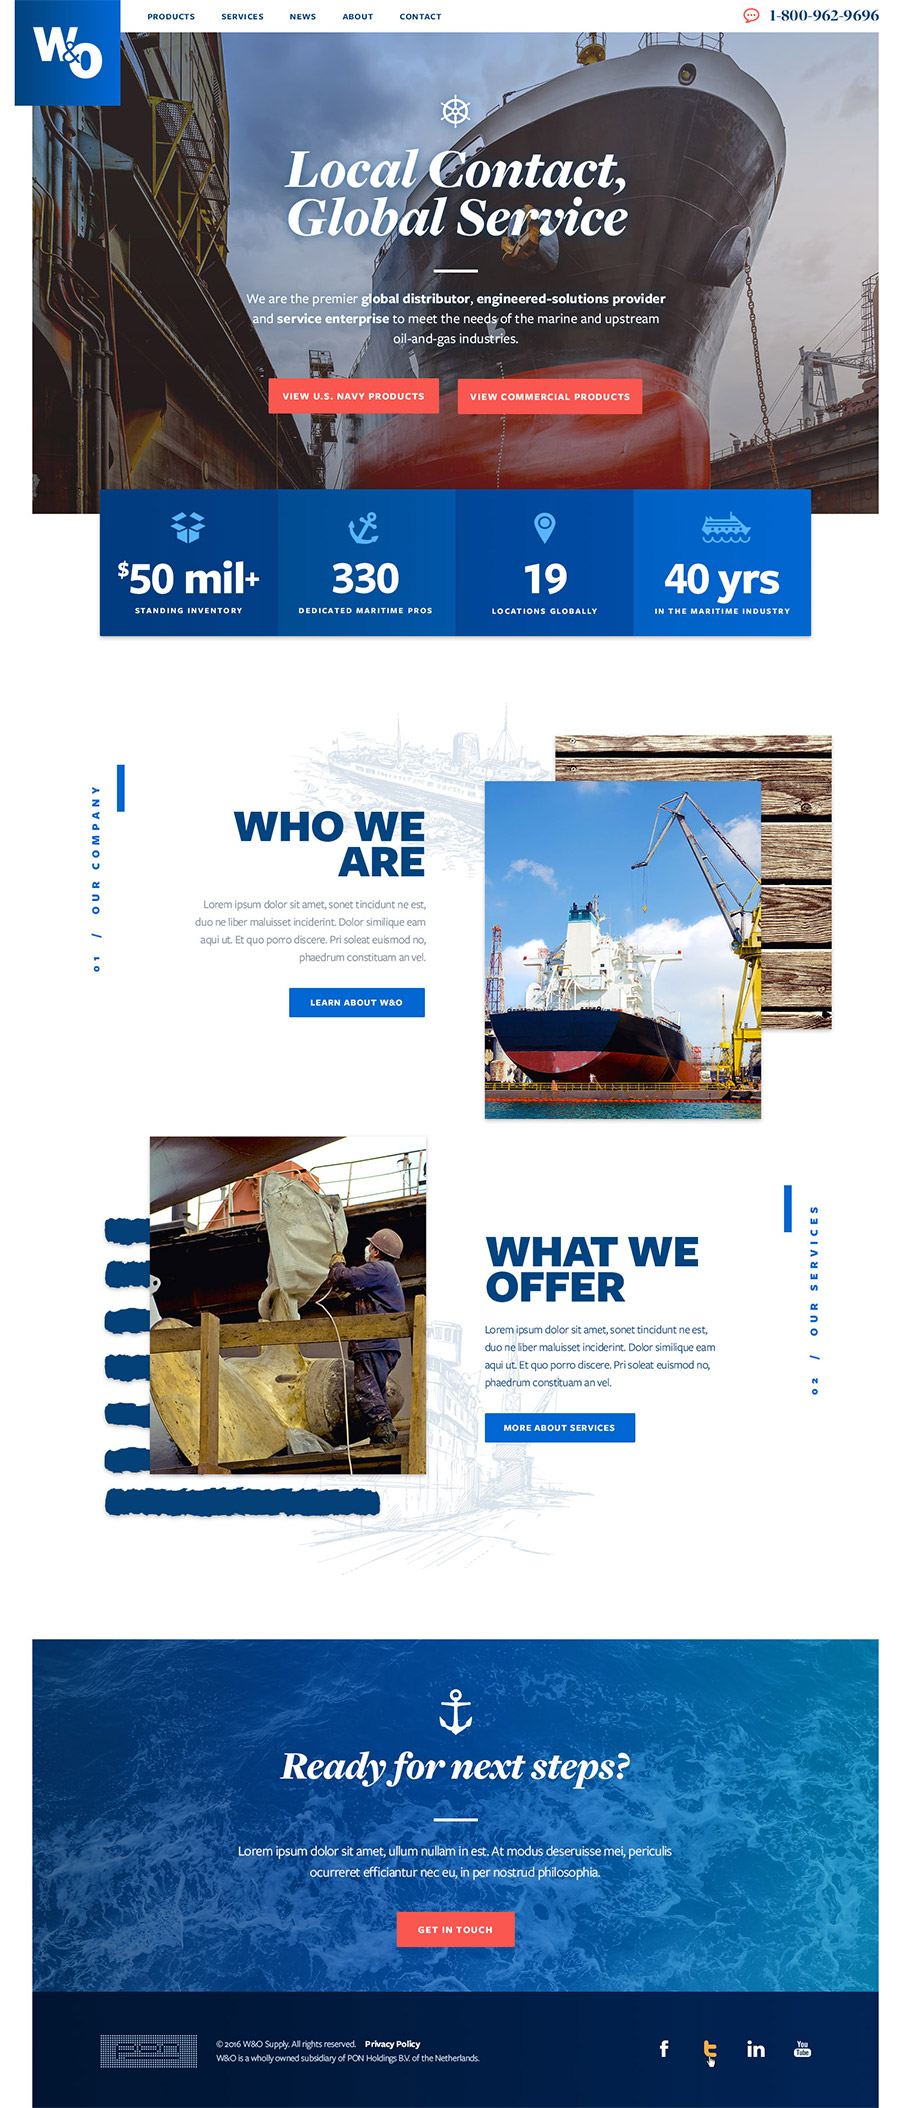 W&O Home Page